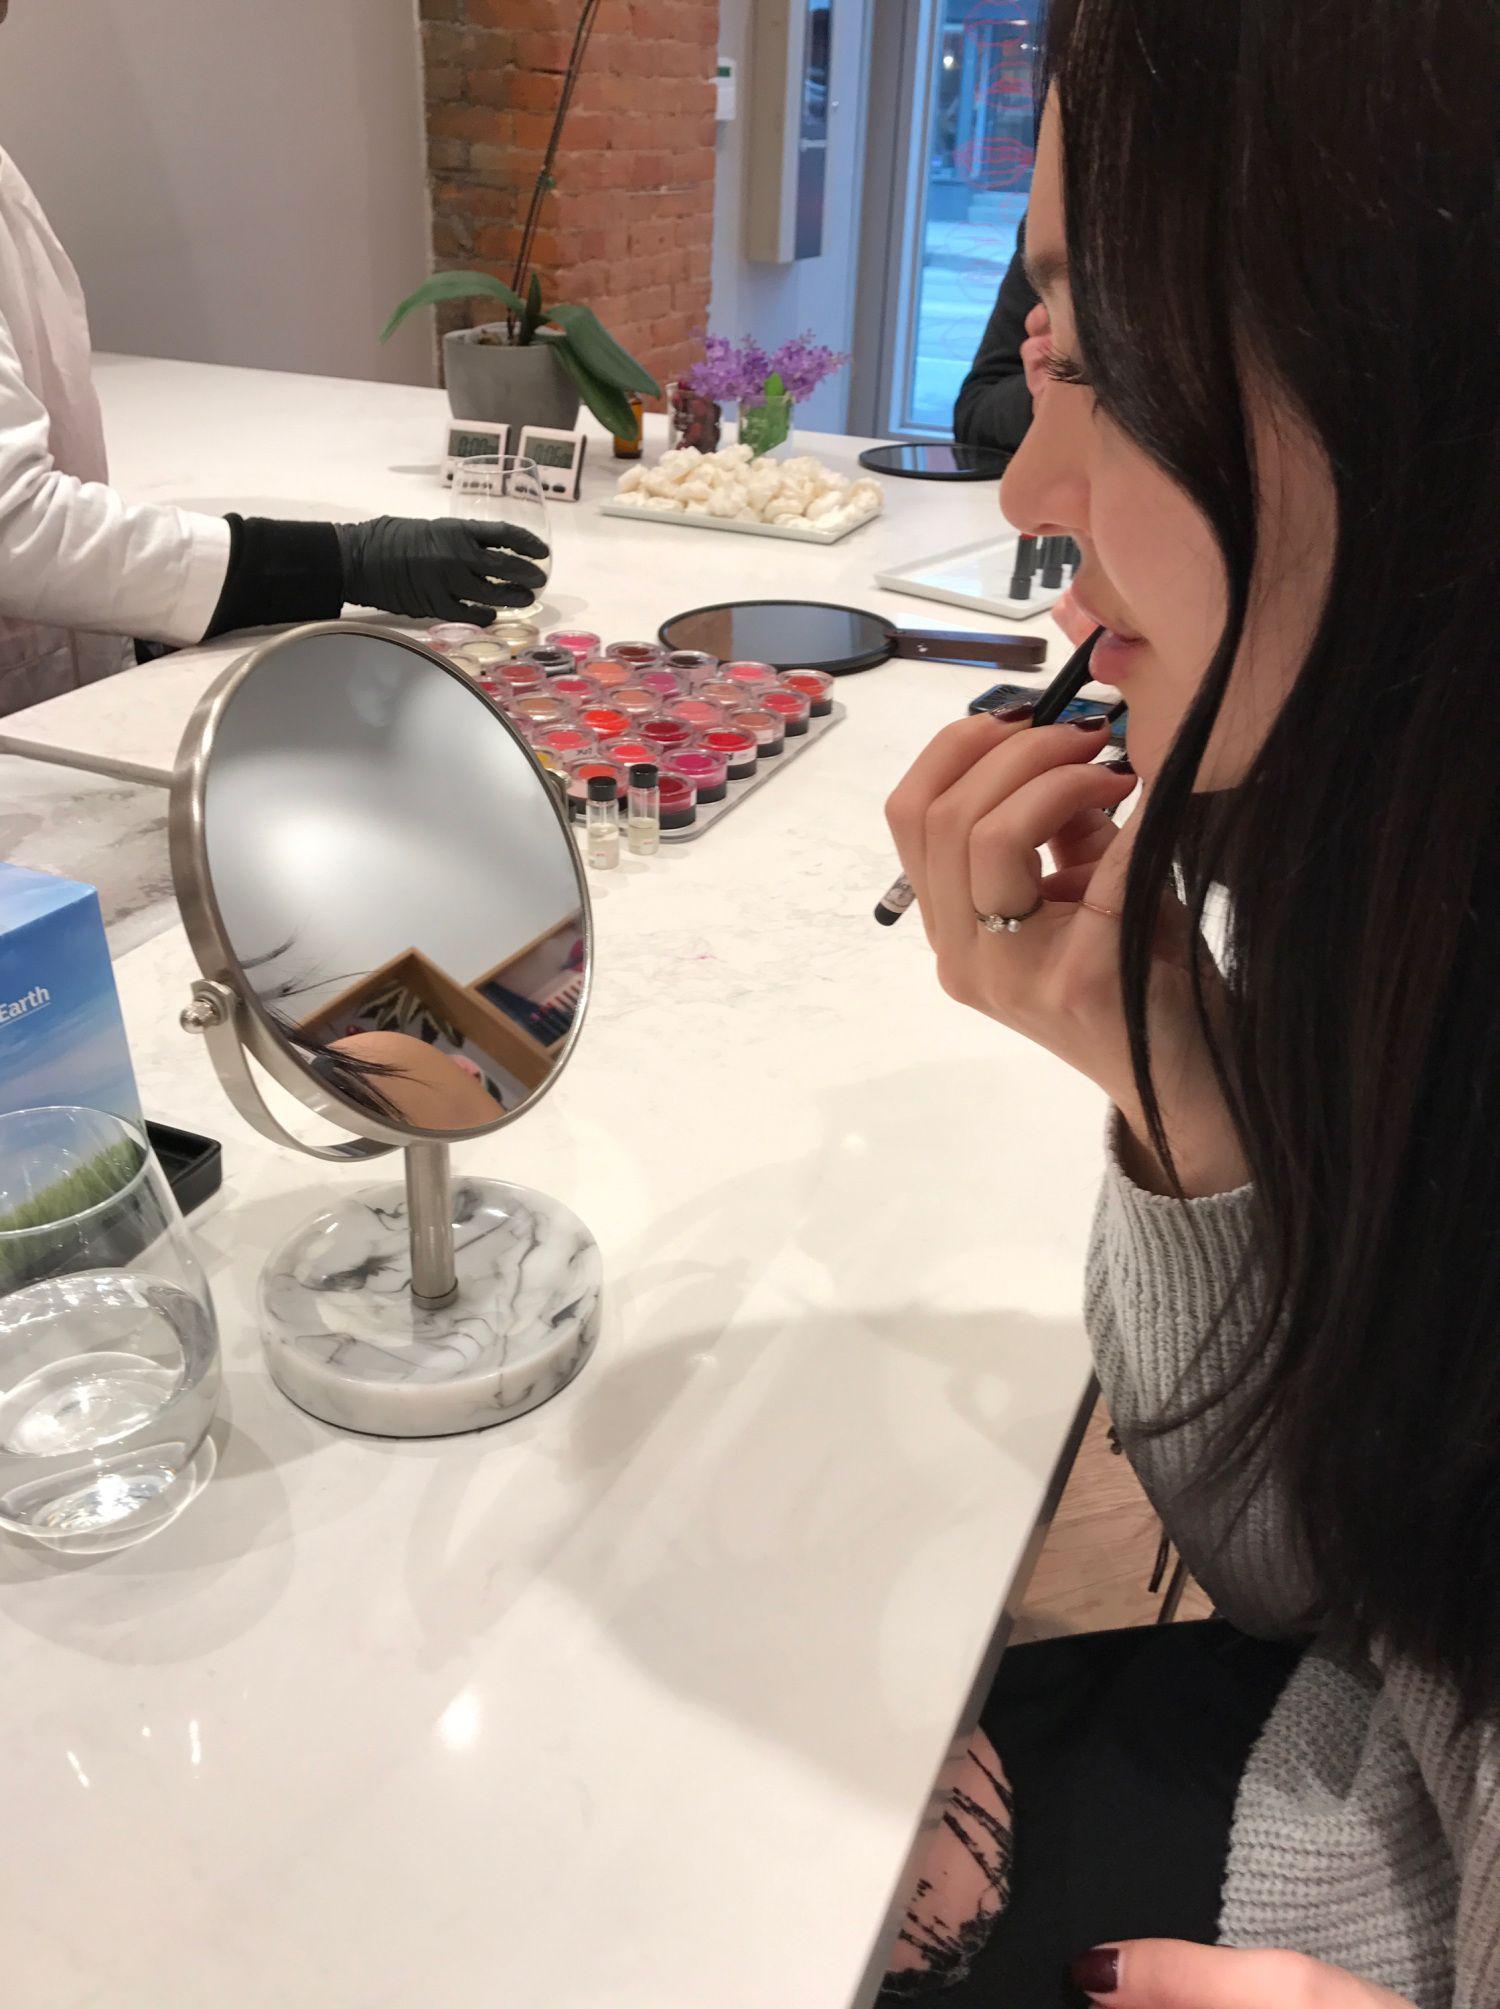 THE BITE BEAUTY LIP LAB | m e cosmetics | Bite beauty lip